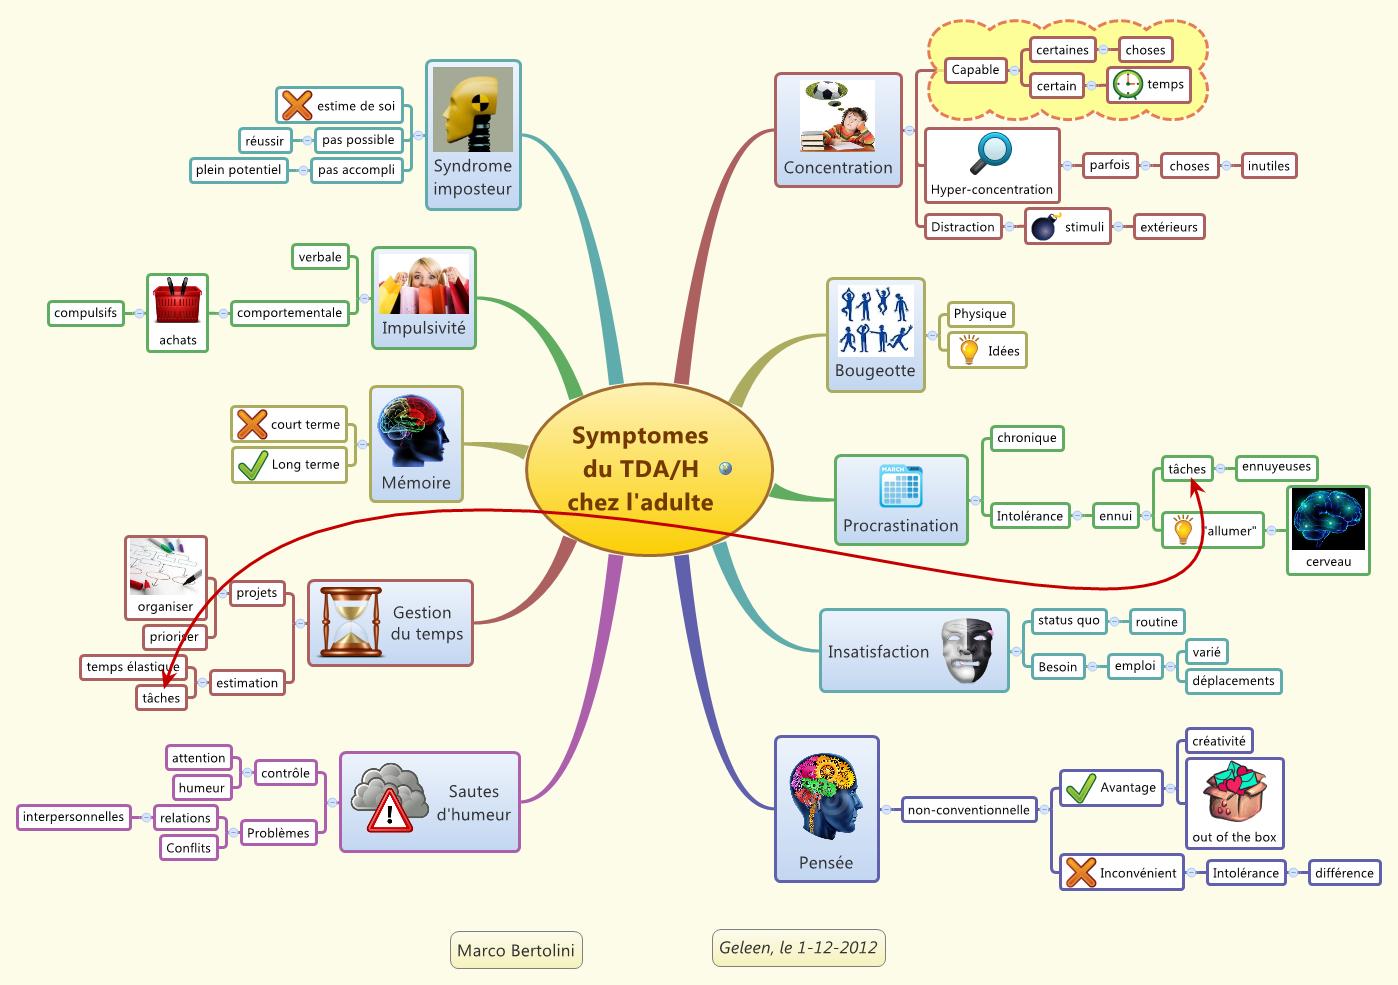 mindmap ou carte heuristique illustrant les symptomes du tdah chez l 39 adulte tda pinterest. Black Bedroom Furniture Sets. Home Design Ideas